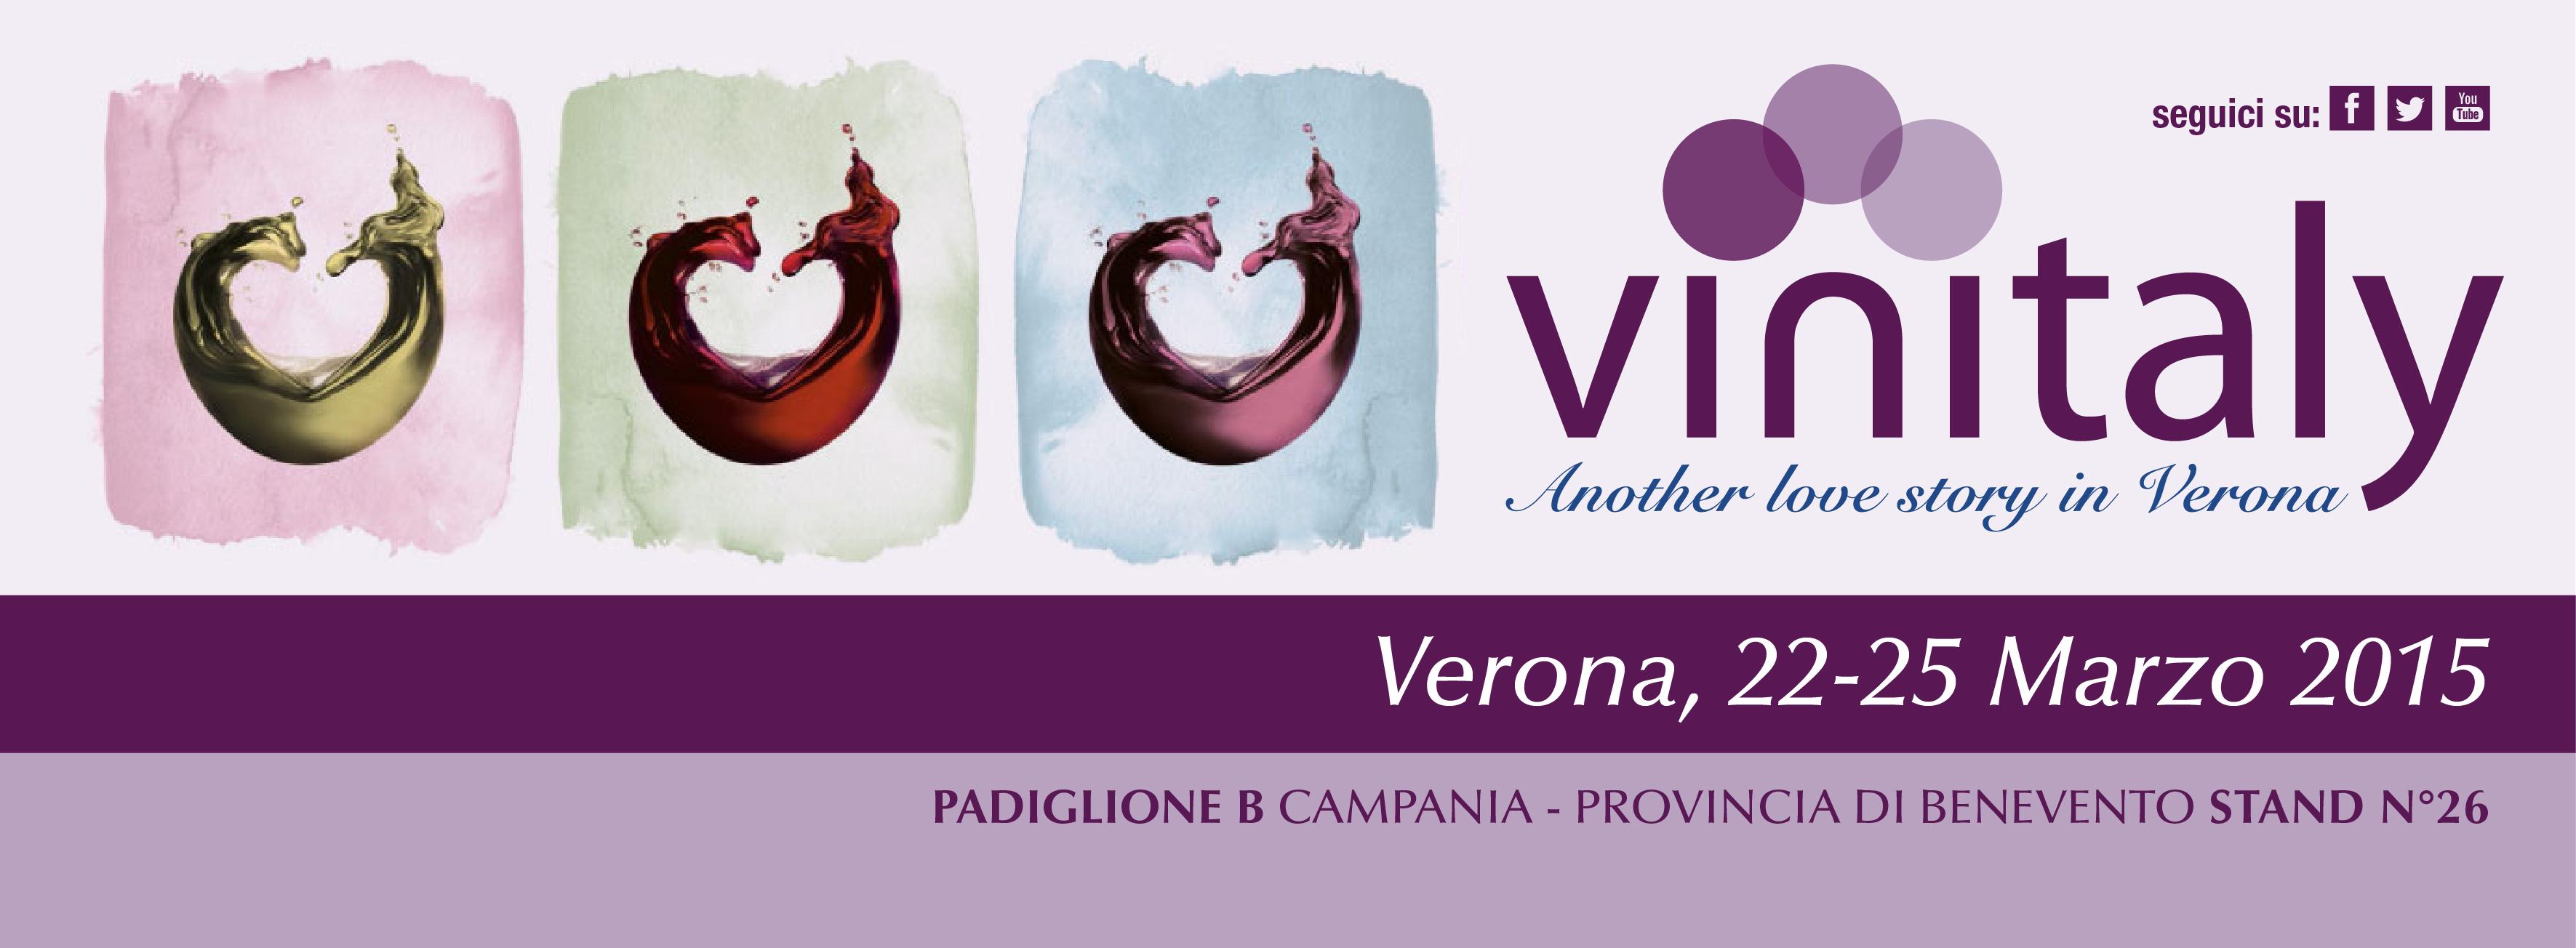 Vinitaly 2015 dal 22 al 25 Marzo 2015